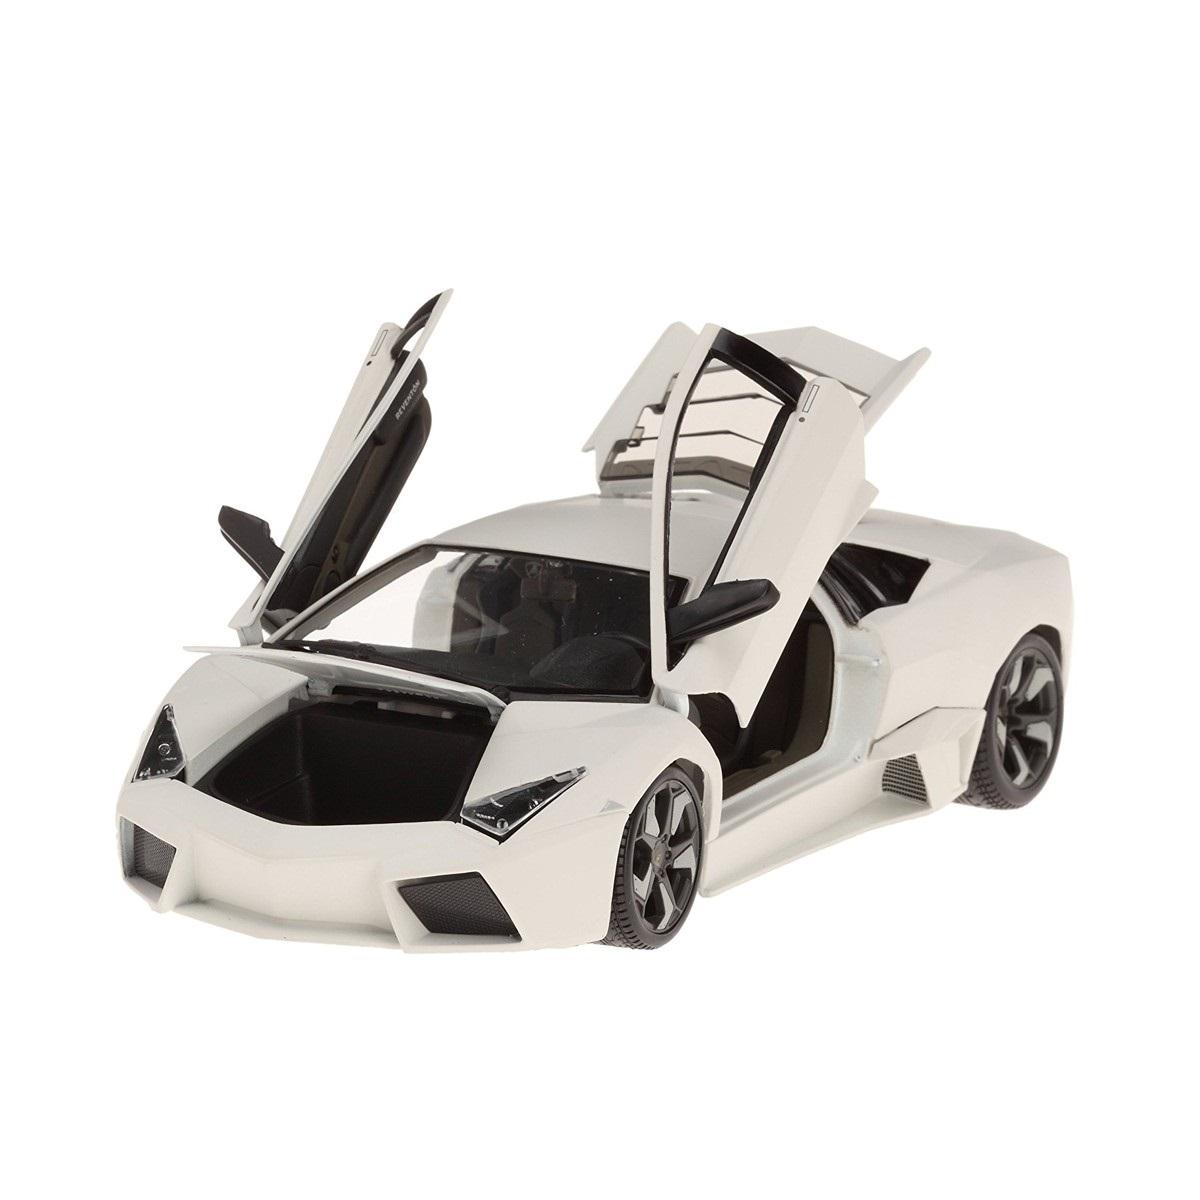 Bburago Машинка металлическая 1:24 Lamborghini Reventon, белый, 18-21041